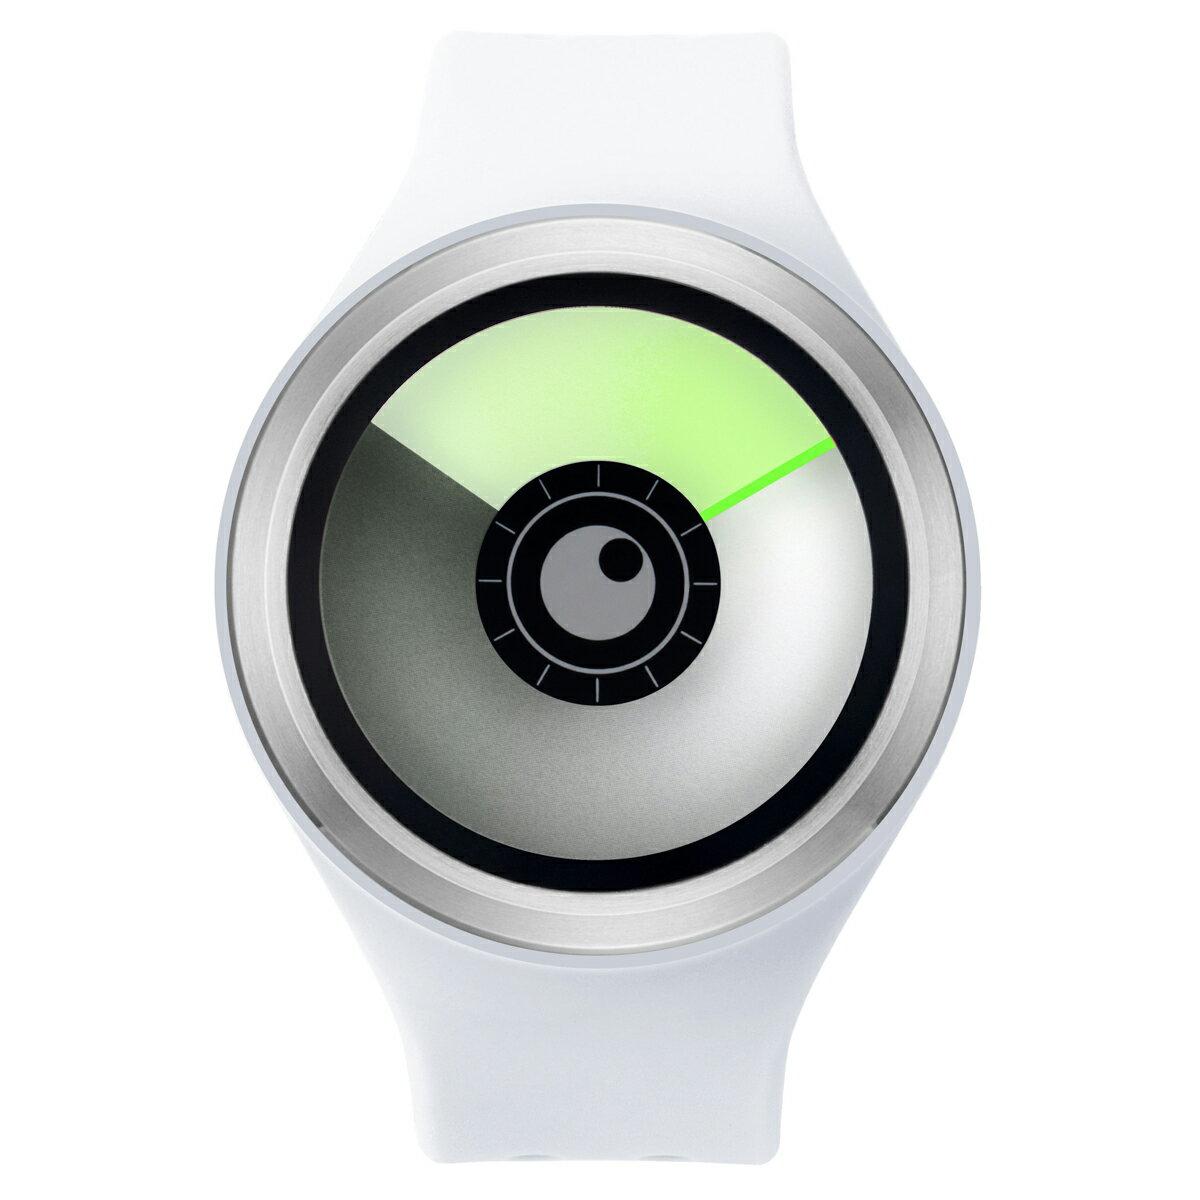 ZEROO AURORA BOREALIS ゼロ 電池式クォーツ 腕時計 [W00703B01SR01] ホワイト デザインウォッチ ペア用 メンズ レディース ユニセックス おしゃれ時計 デザイナーズ